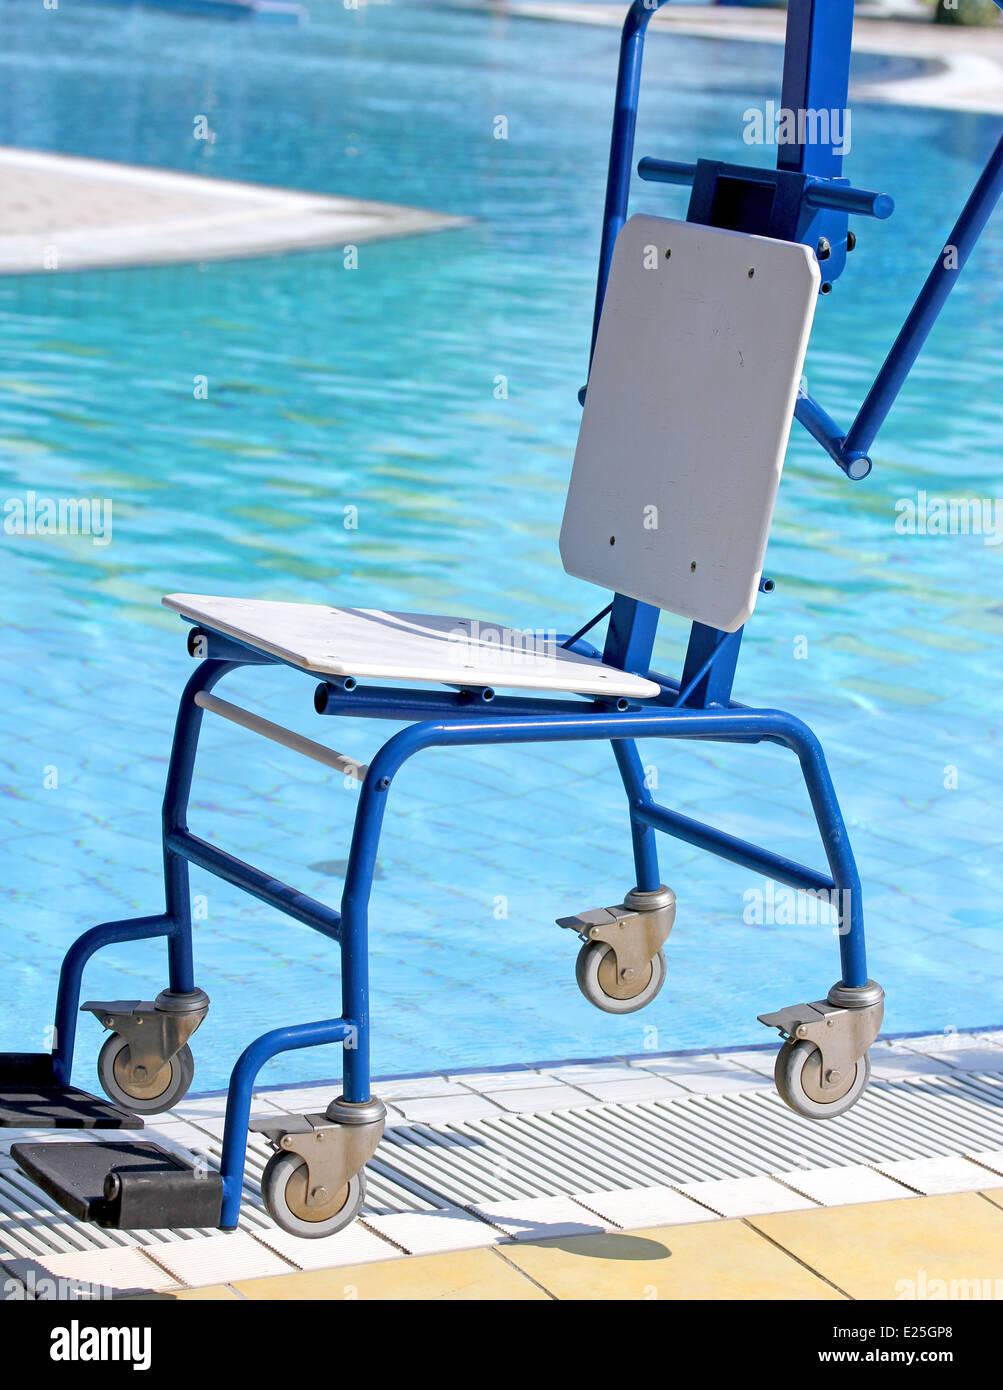 The Bath Chair And Wheelchair Stock Photos & The Bath Chair And ...